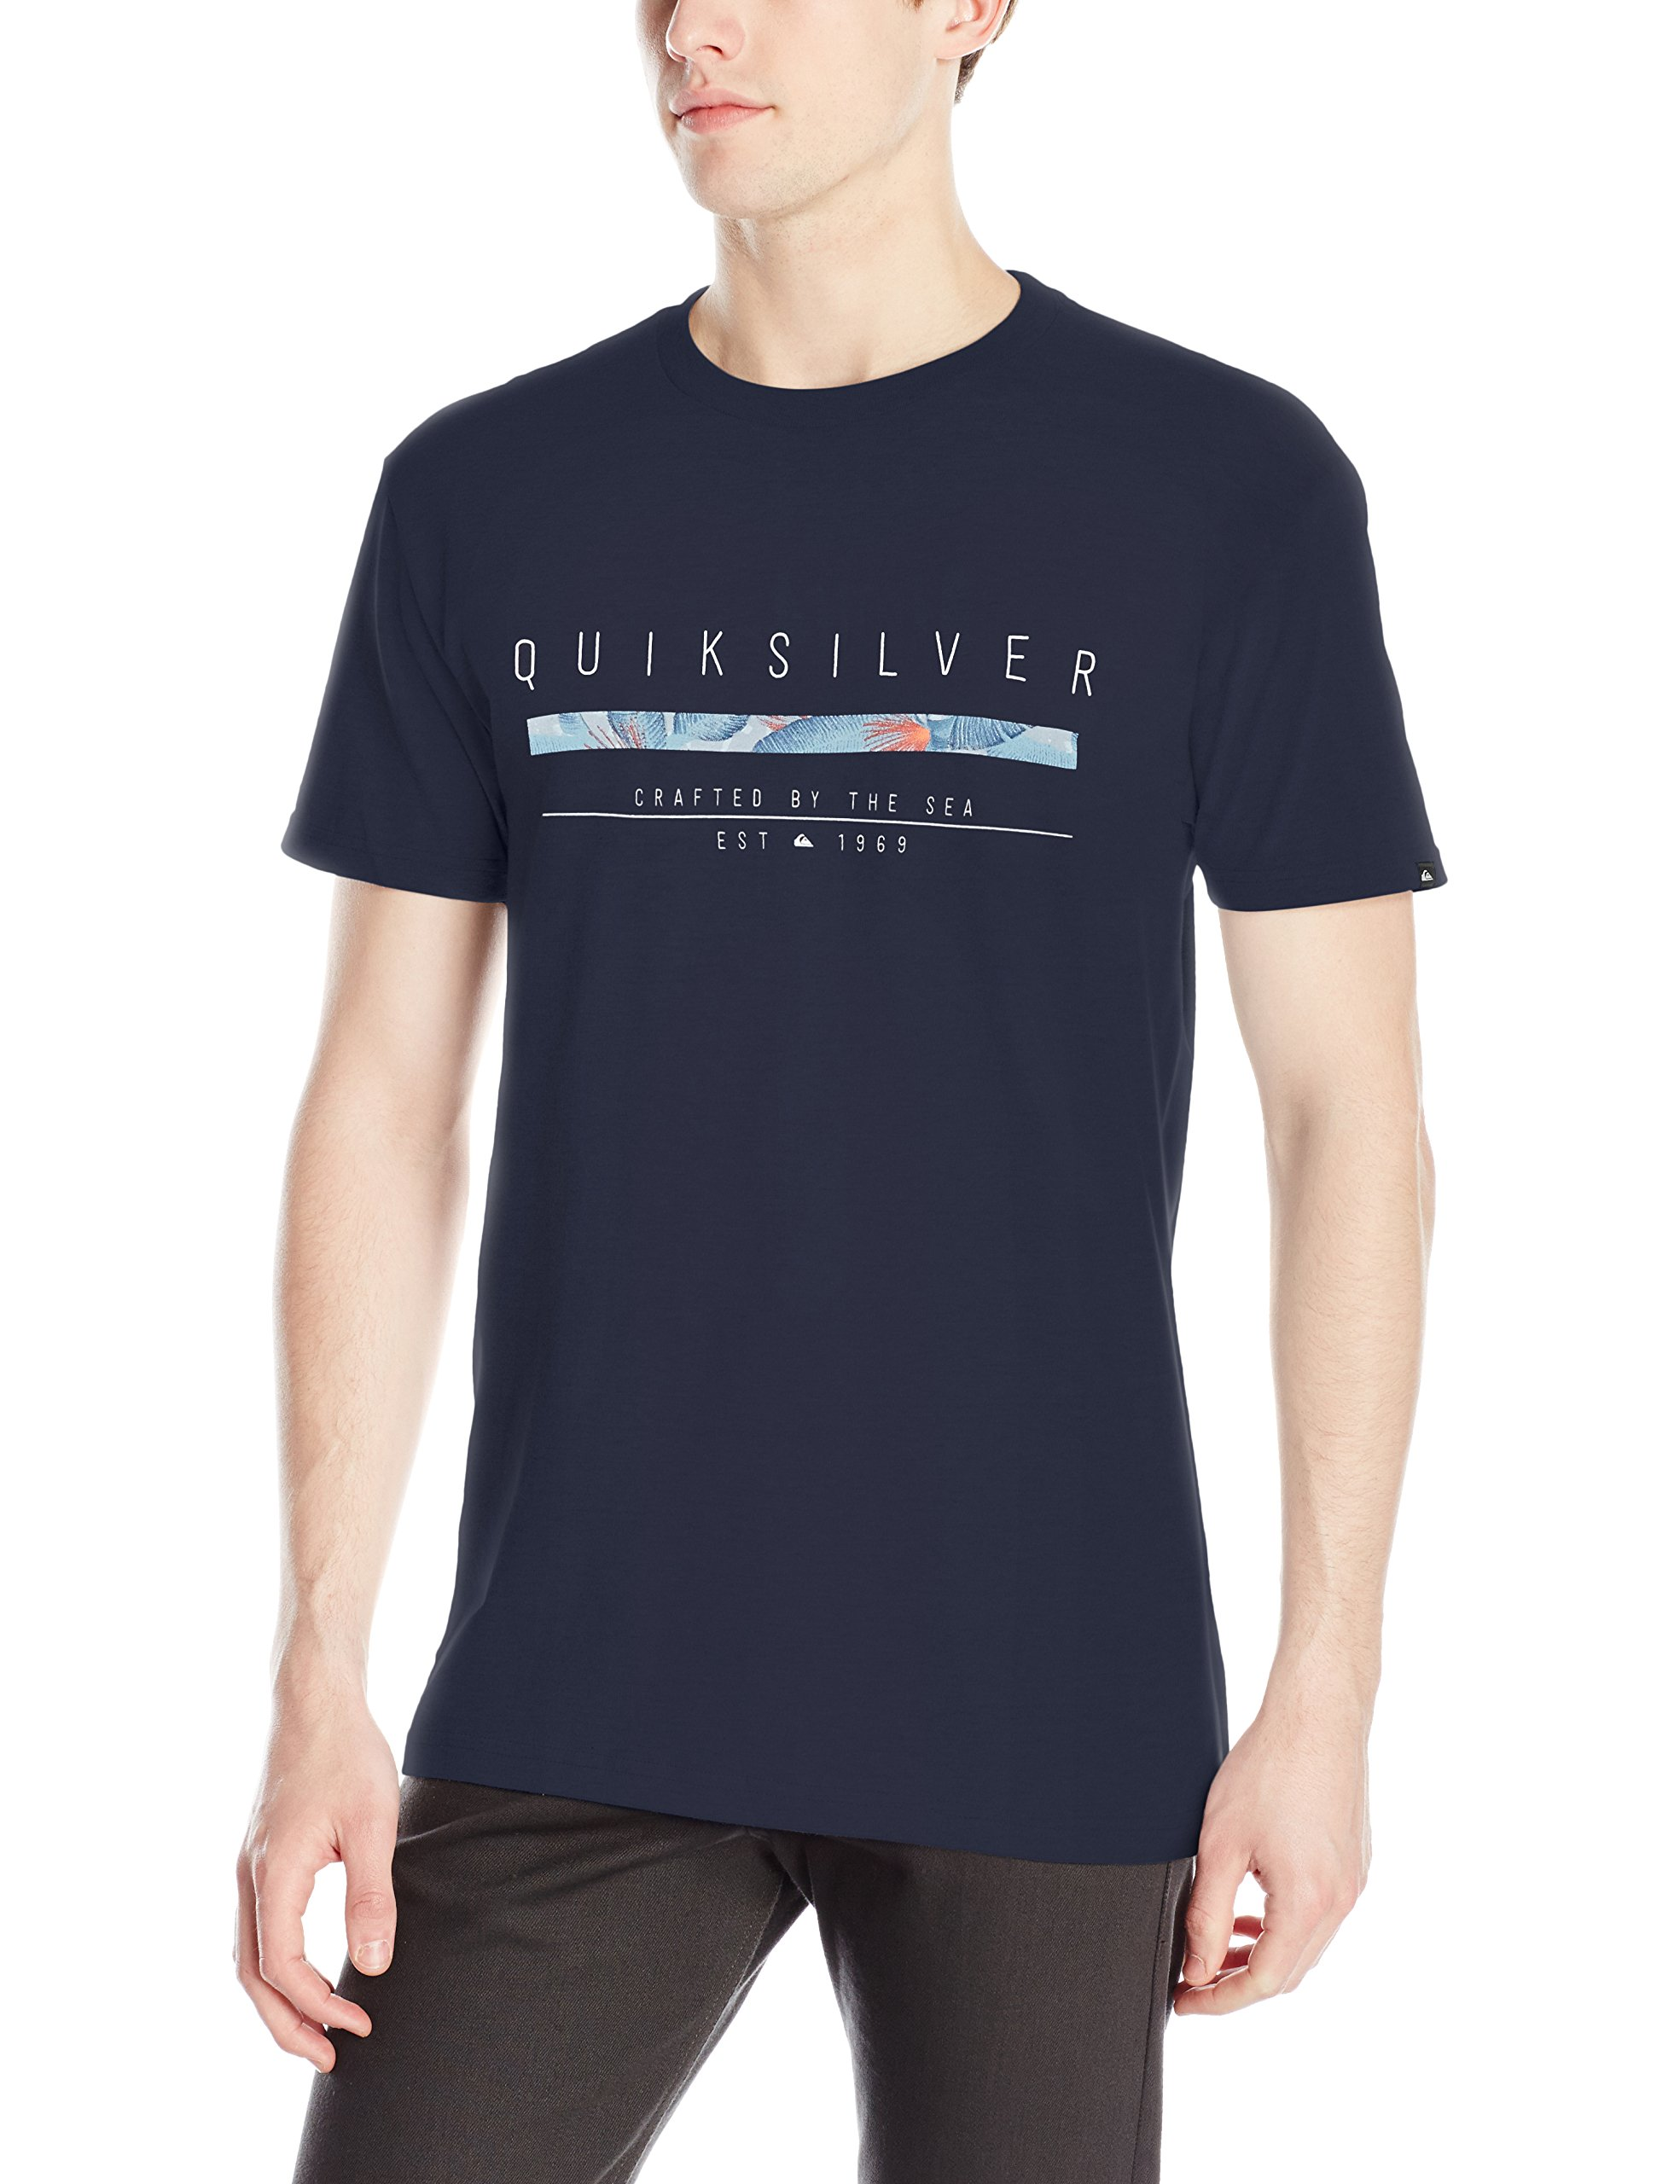 Quiksilver Men's Static T-Shirt, Navy Blazer, Medium